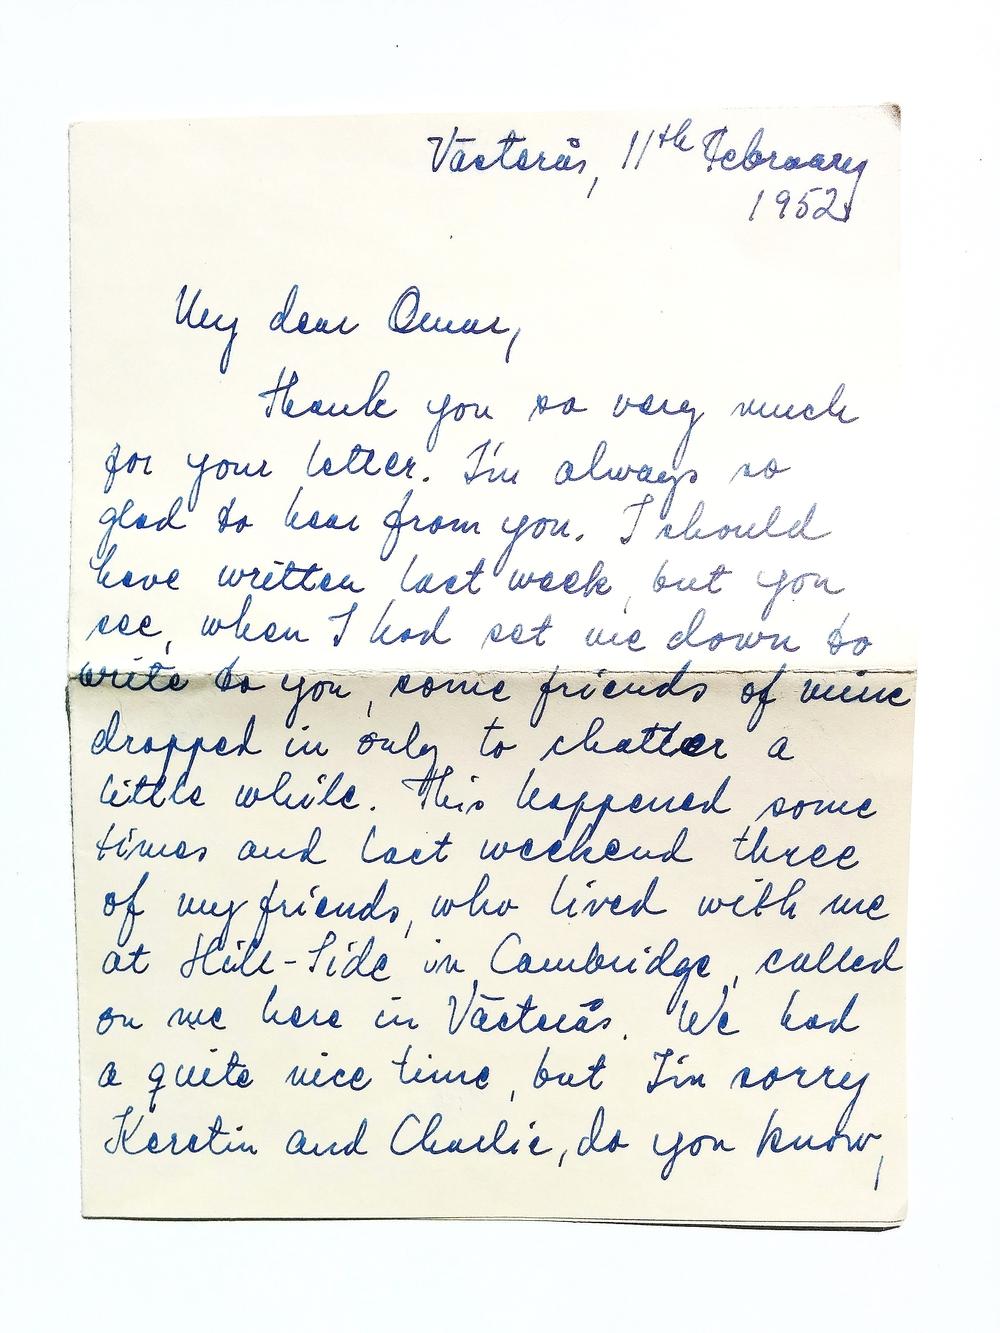 February 11th, 1952